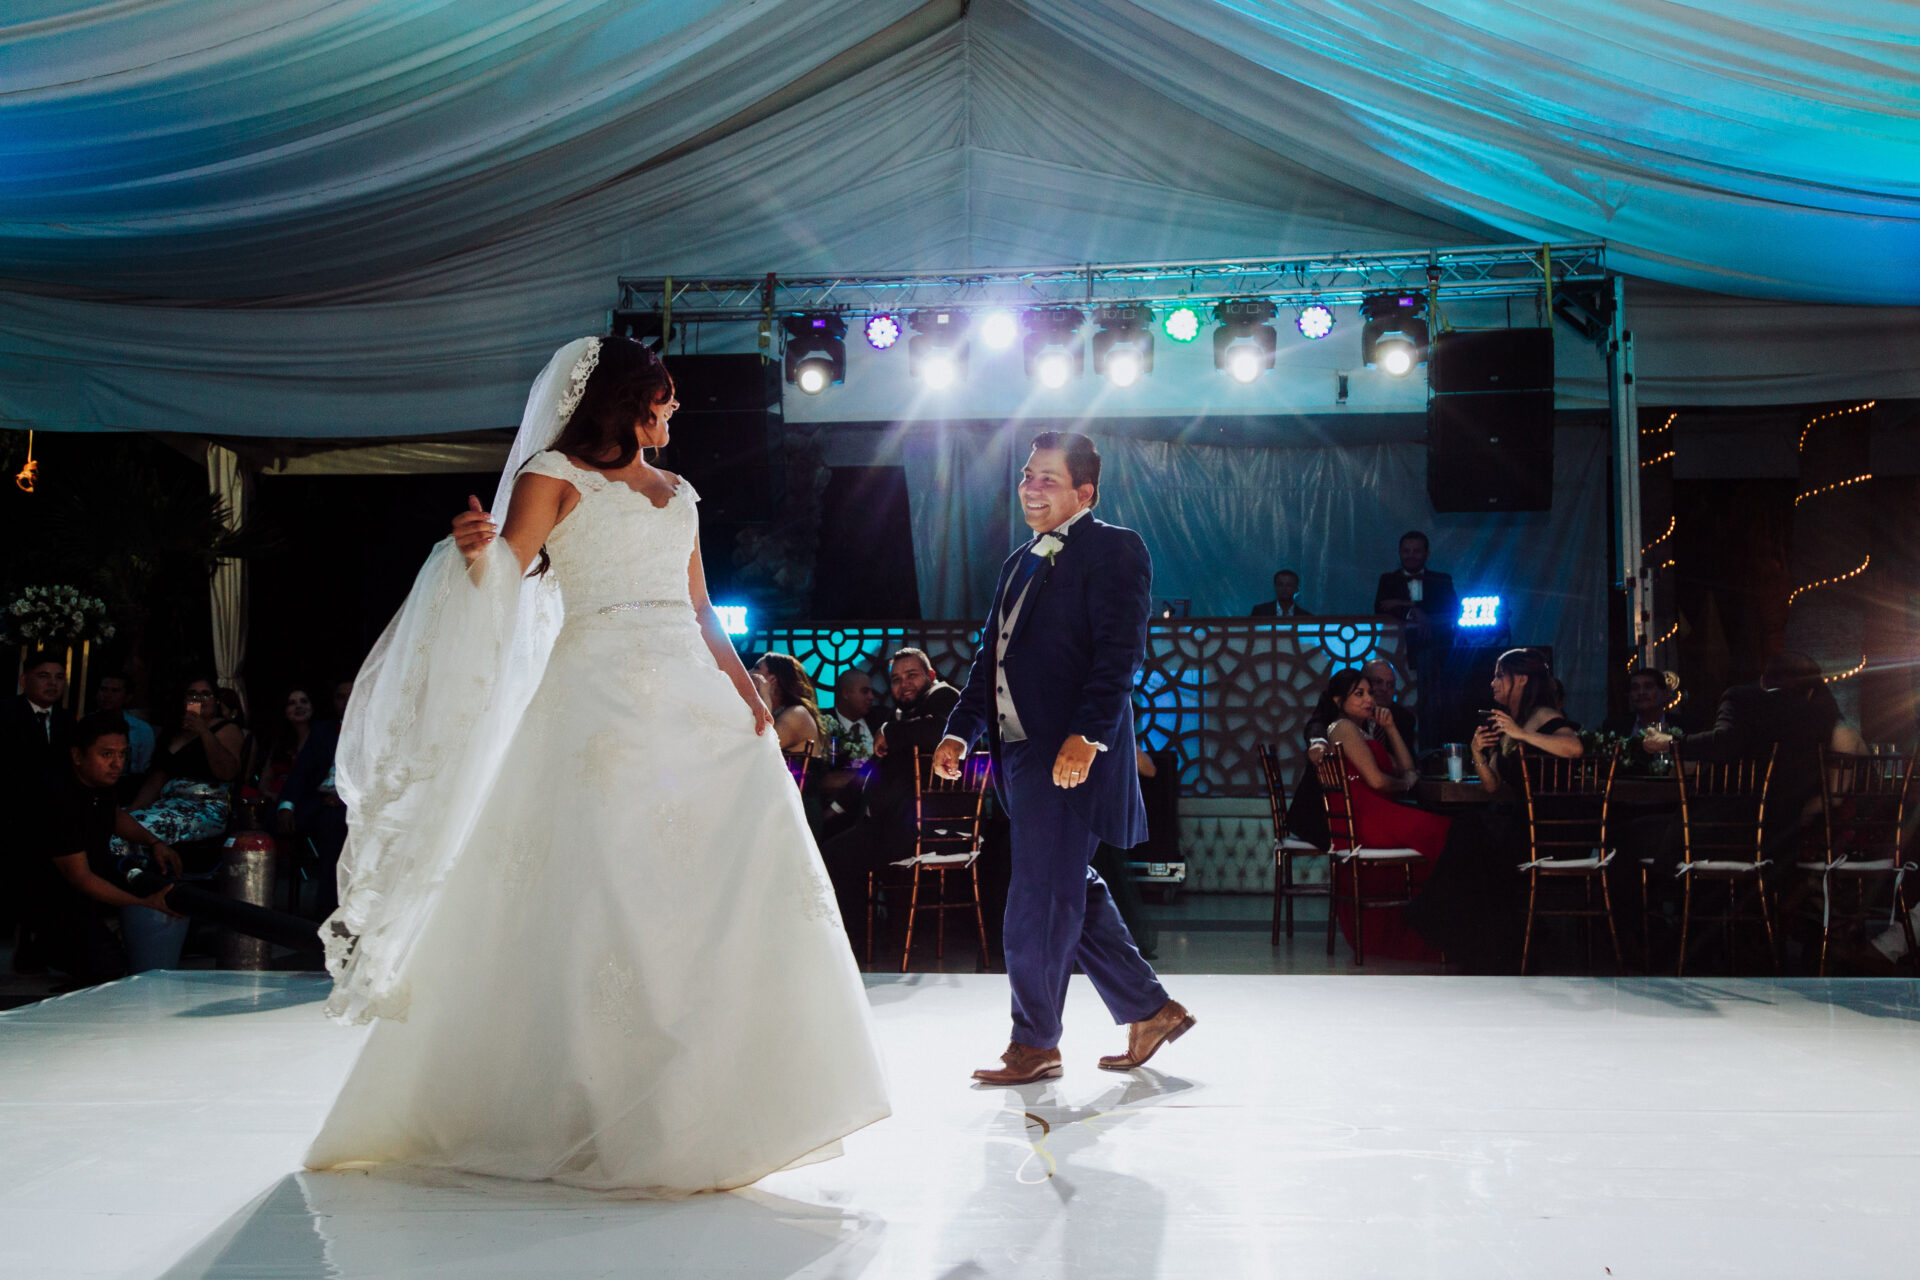 javier_noriega_fotografo_bodas_torreon_coahuila_zacatecas_wedding_photographer54a